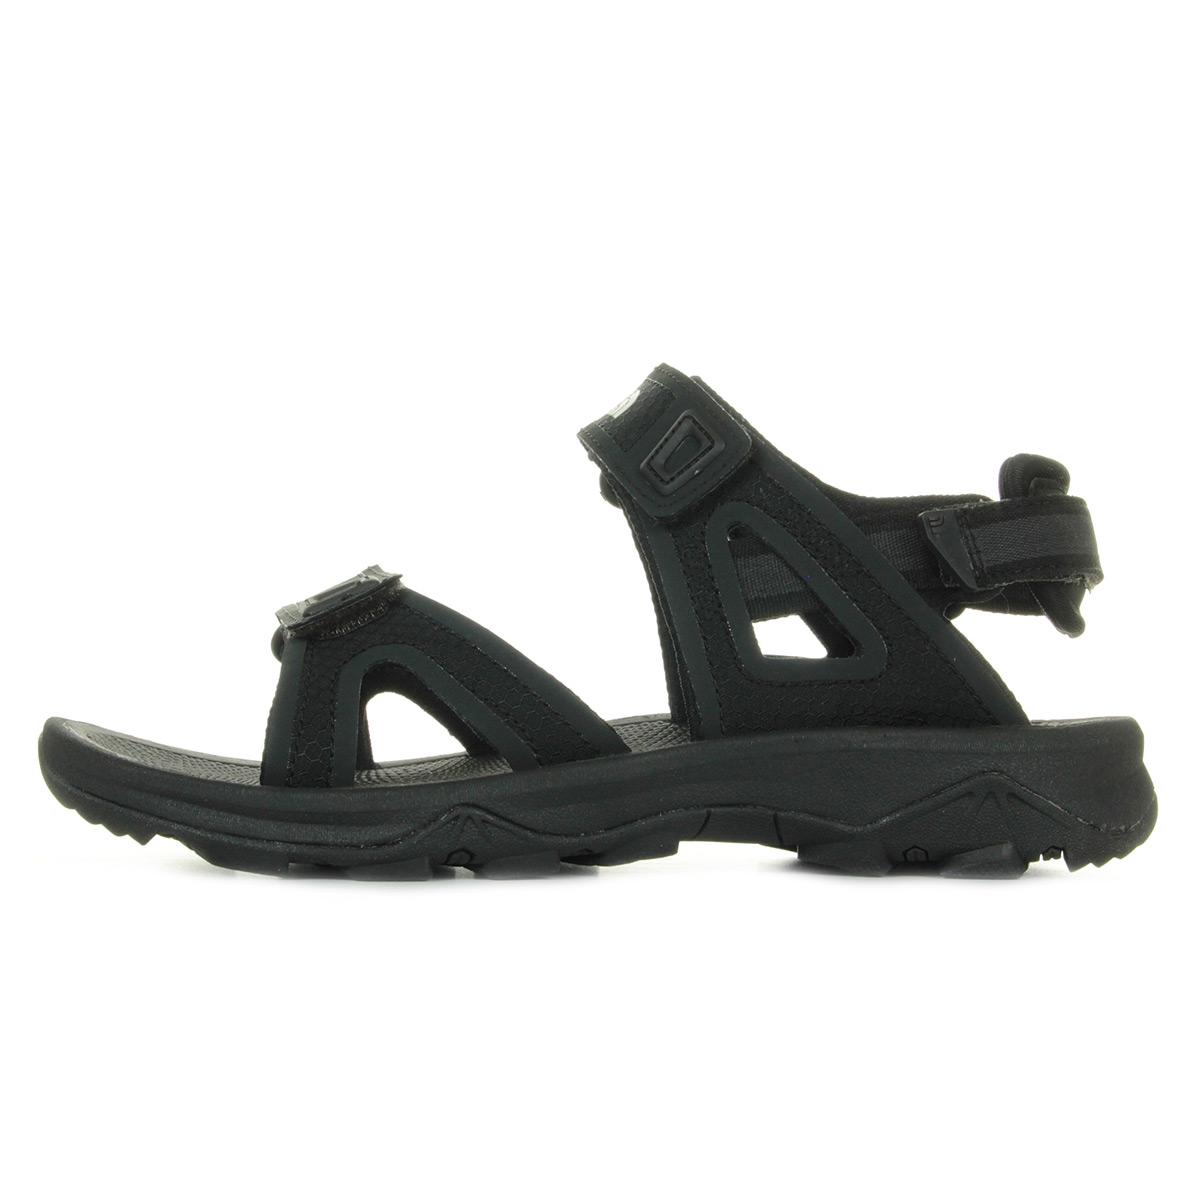 The North Face Hedgehog Sandal II T0CXS5LQ6 noir sandales adidas Pro Model  80s chaussures 4 Palladium 32122cd38356